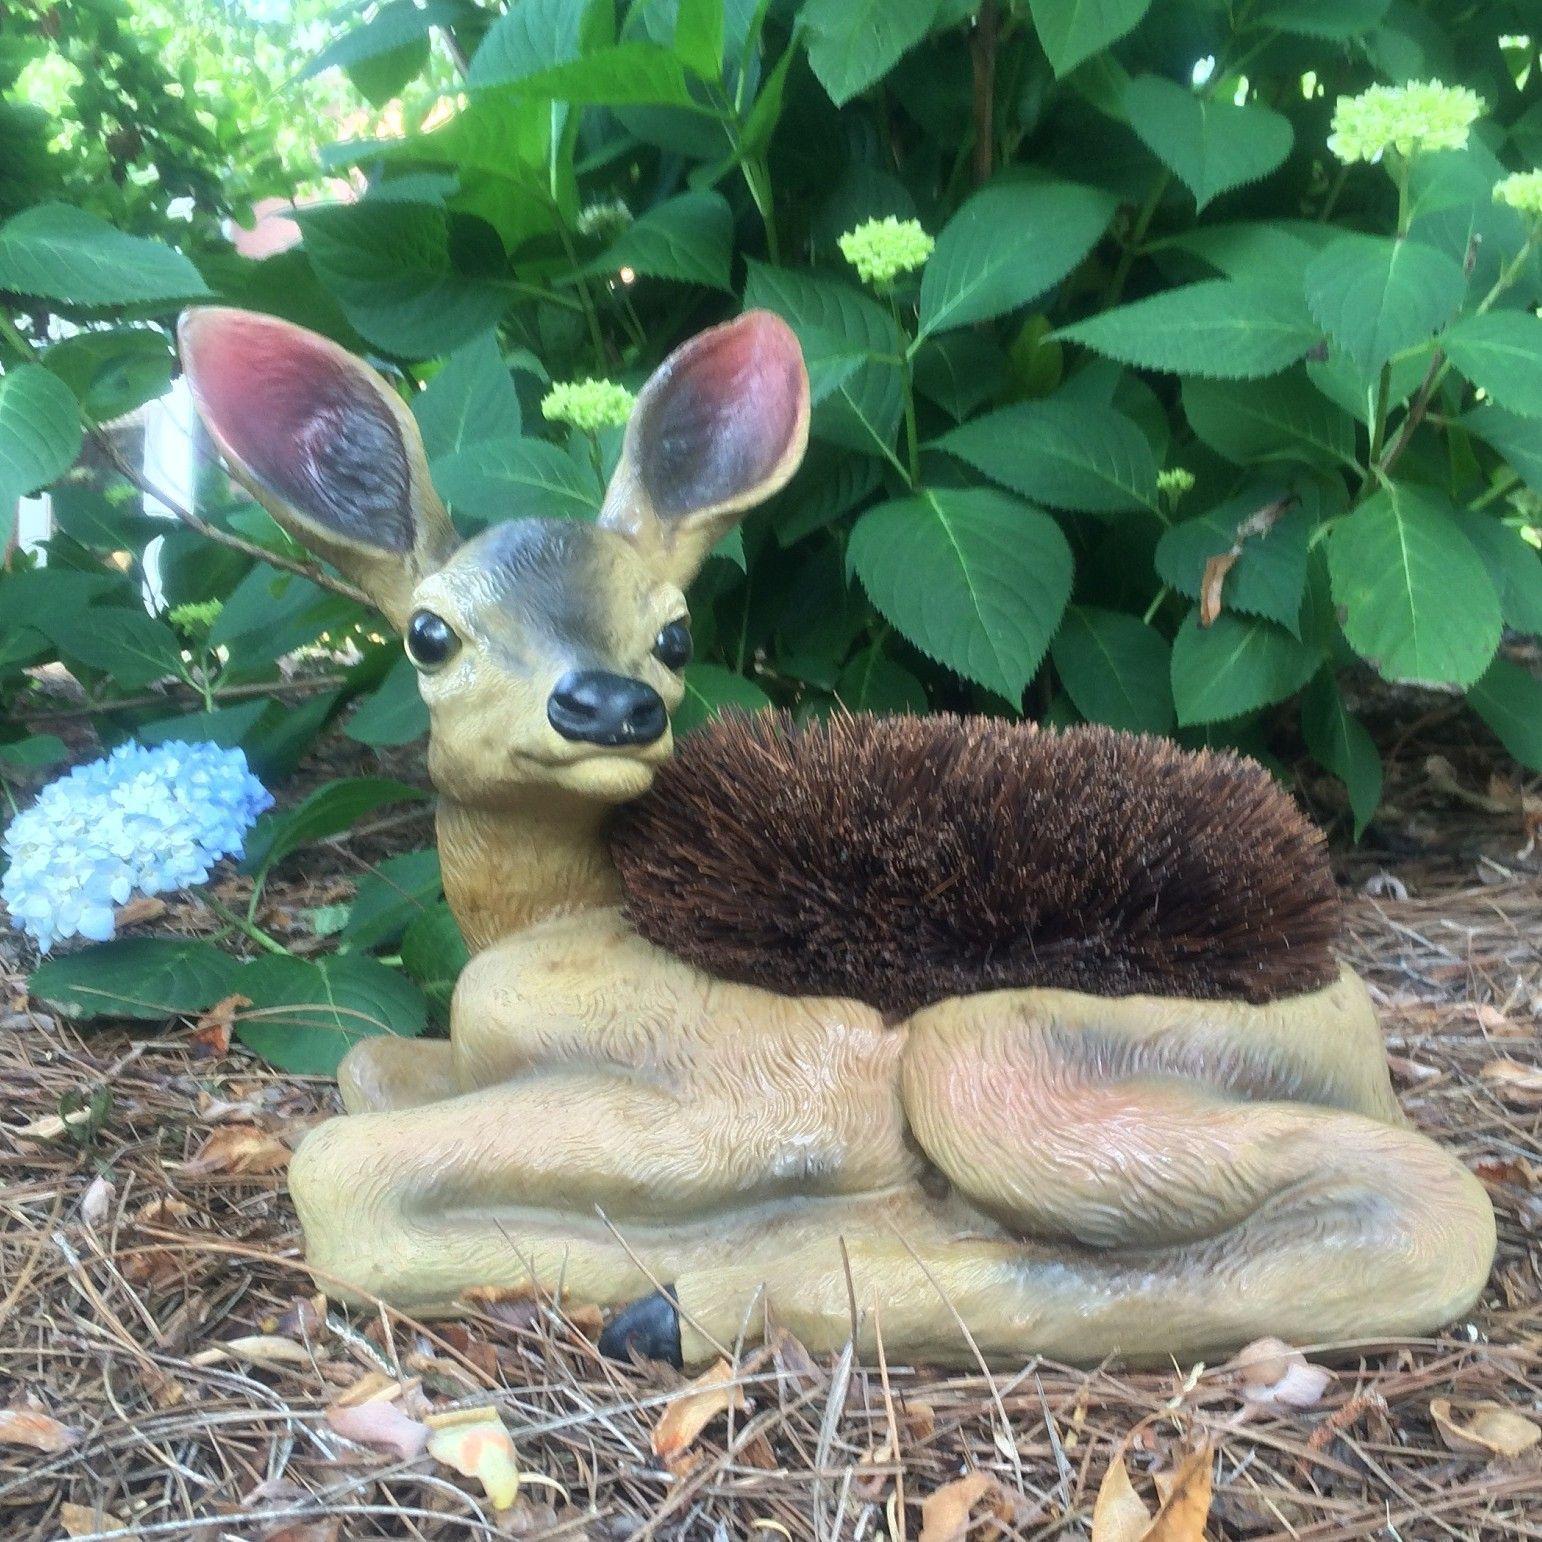 Call of The Wild Deer Boot Brush Scraper Fawn Statue